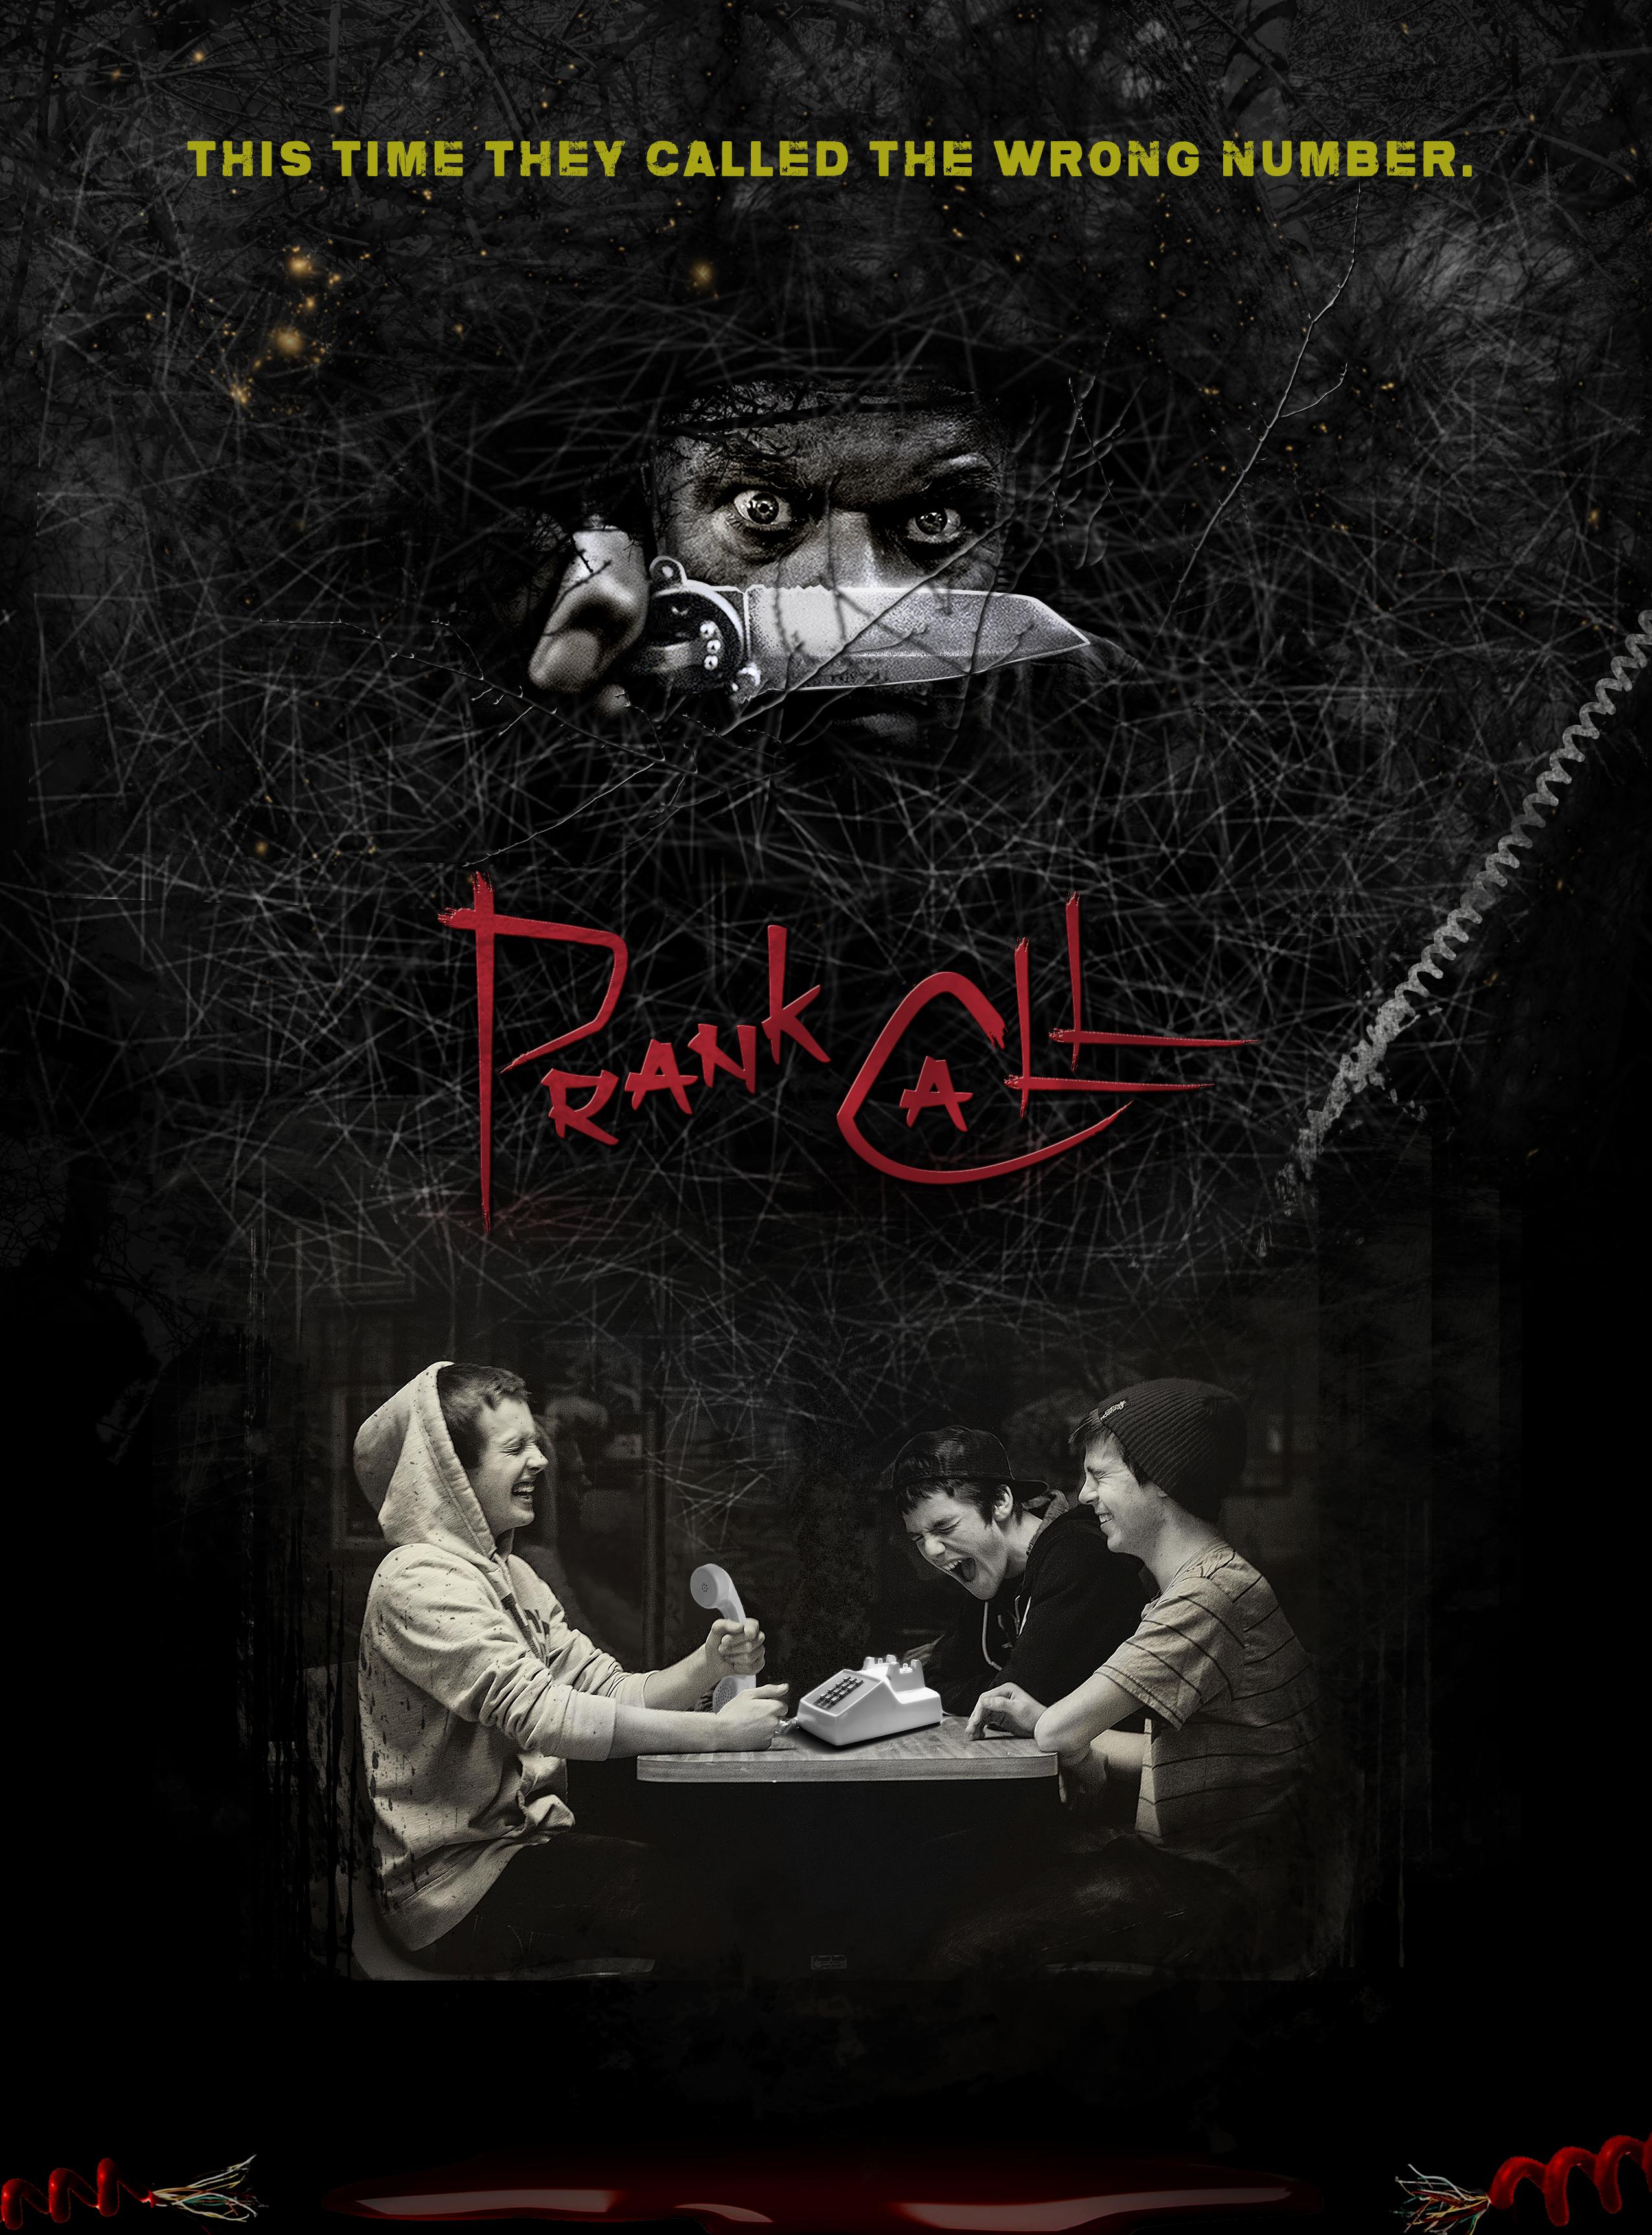 Prank Call - IMDb